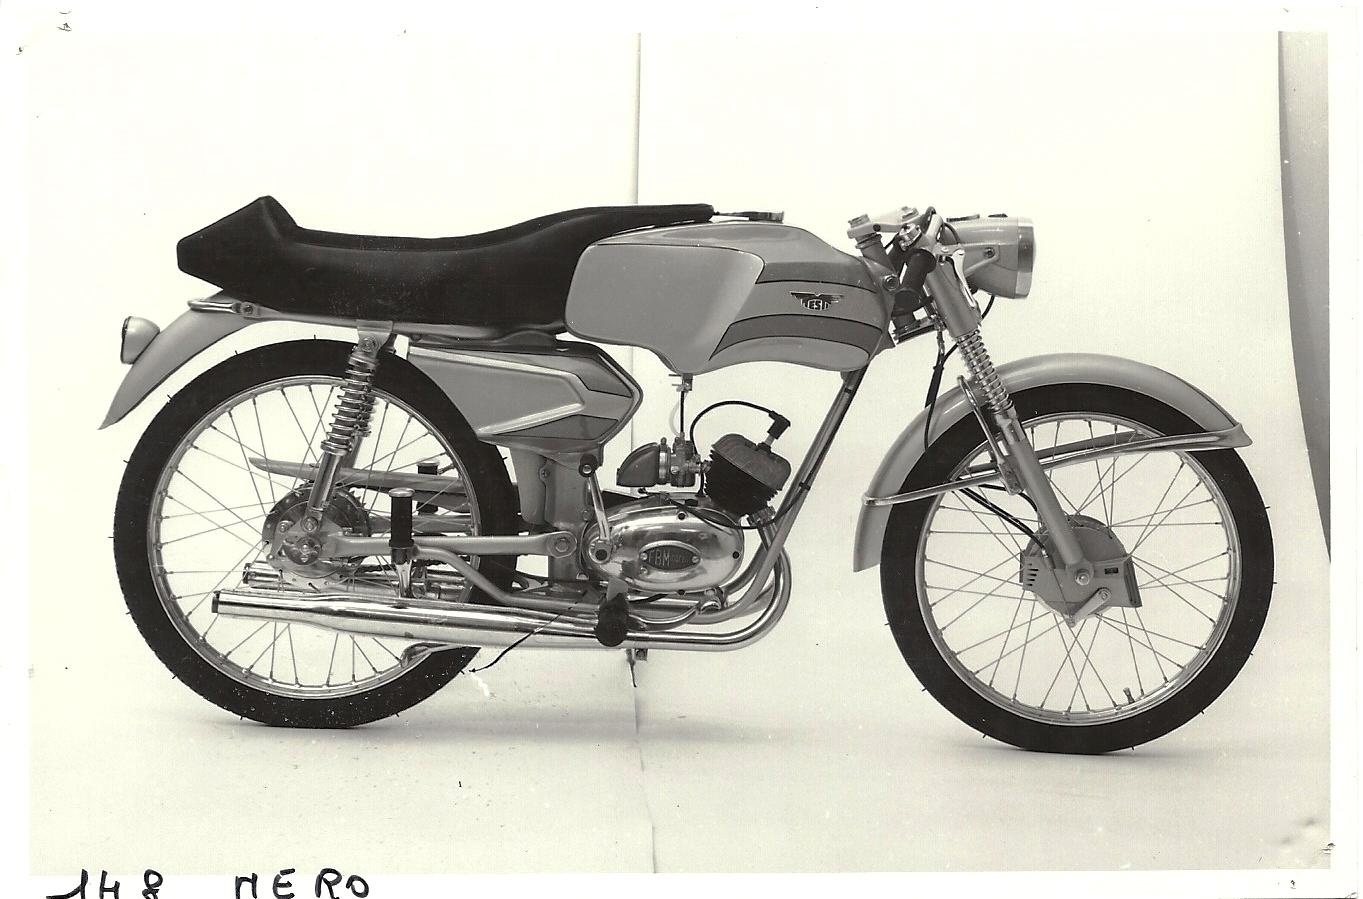 1965 - Testi Telstar-01